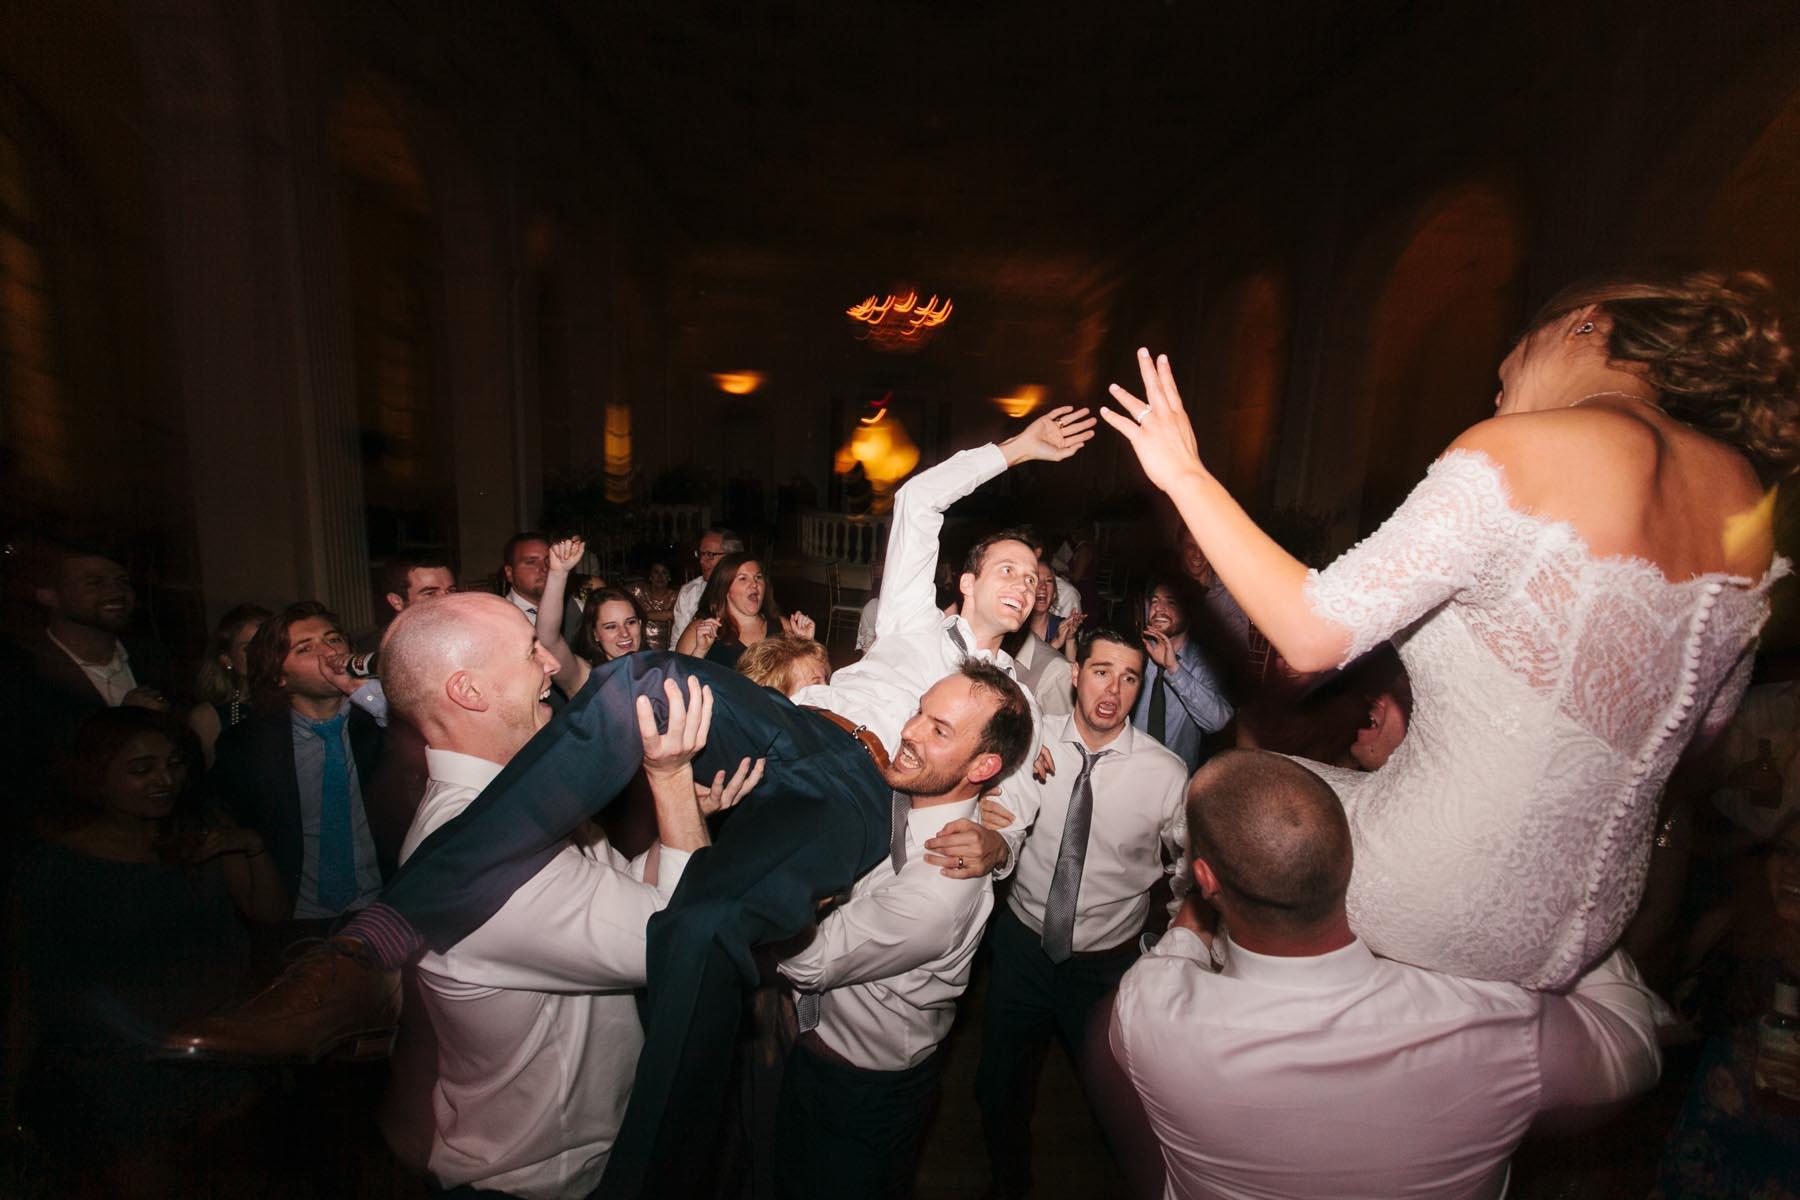 kjellman wedding blog biltmore wedding -131